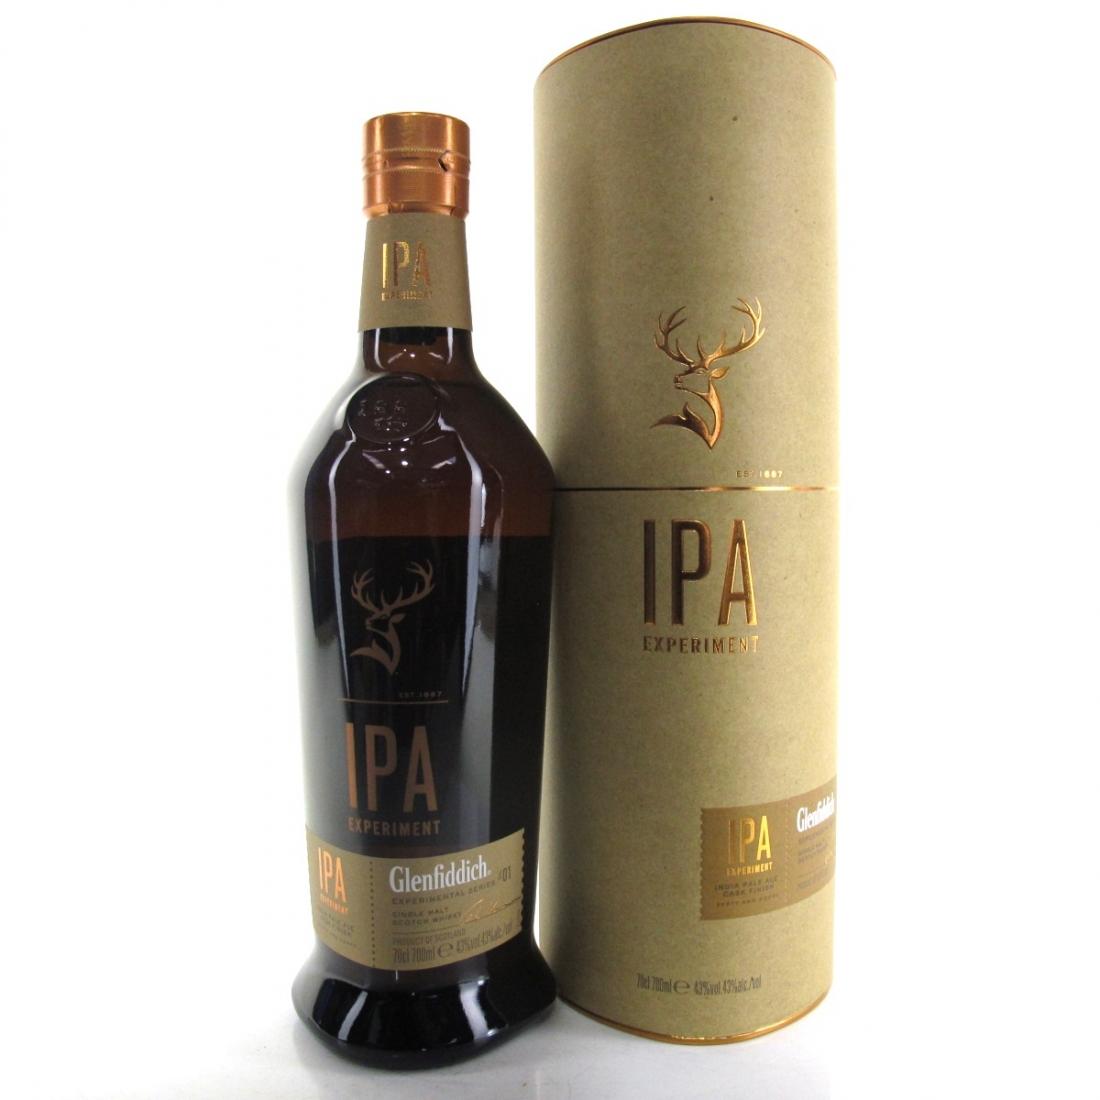 Glenfiddich Experimental Series #1 IPA